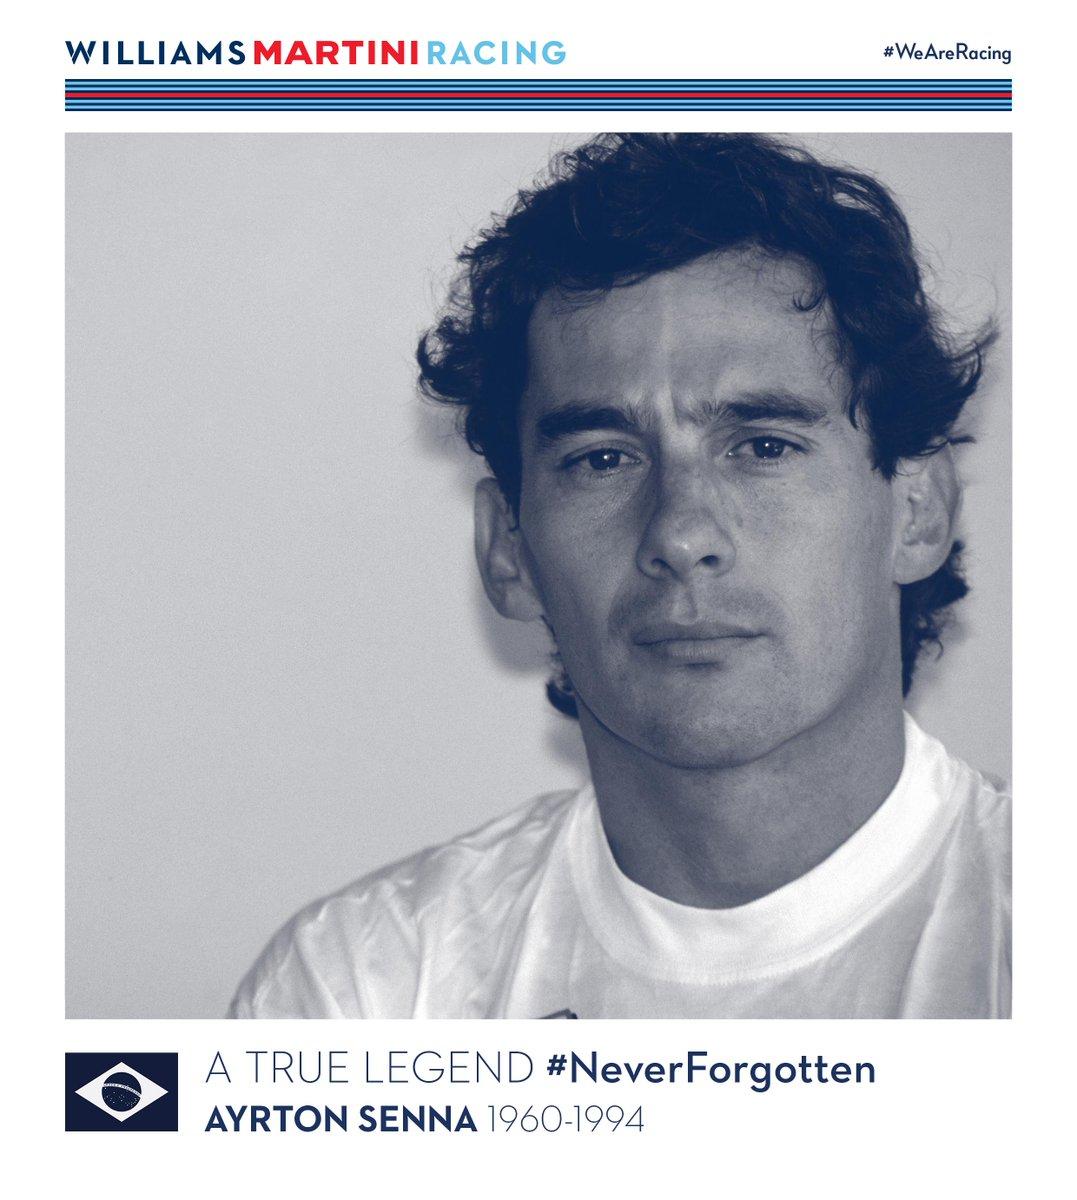 Ayrton Senna - A true legend. Gone but never forgotten. #SennaSempre  #NeverForgotten https://t.co/KjkLWfgagl